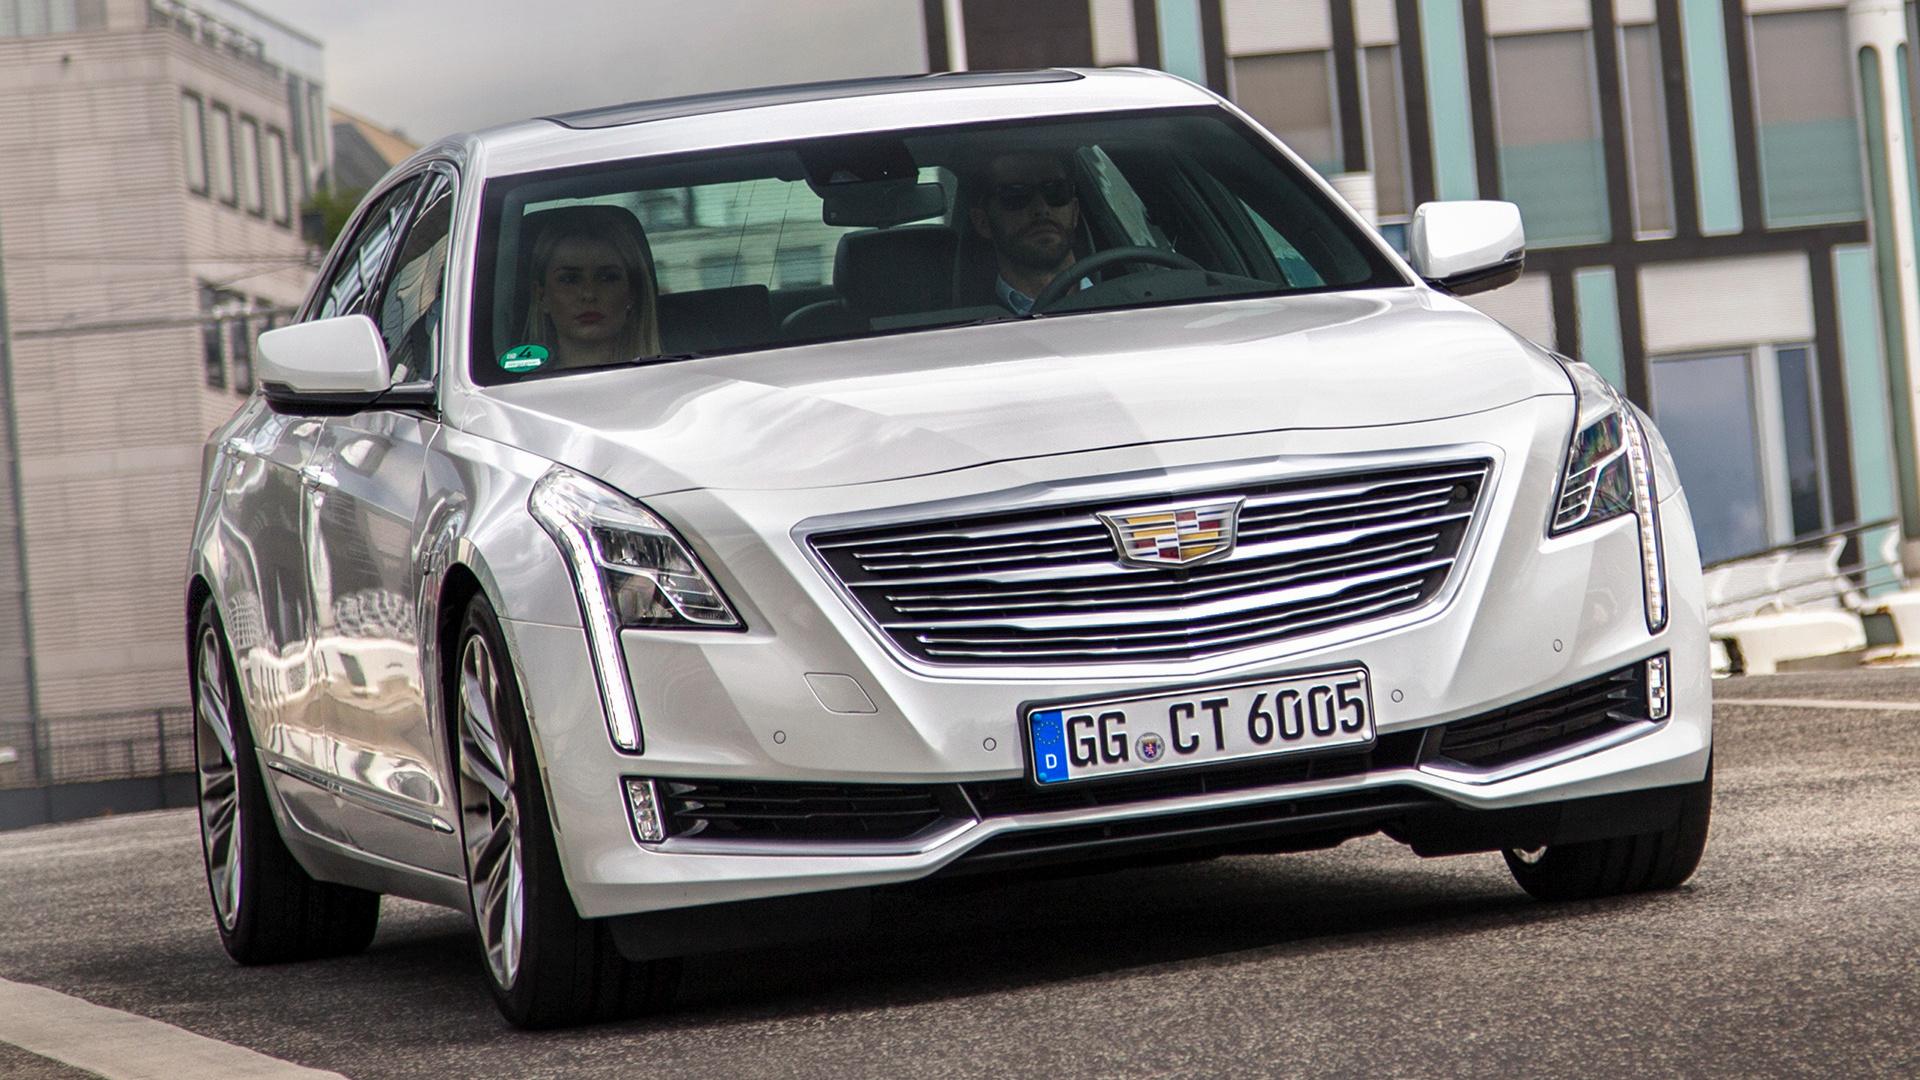 2016 Cadillac CT6 (EU) - Wallpapers and HD Images | Car Pixel